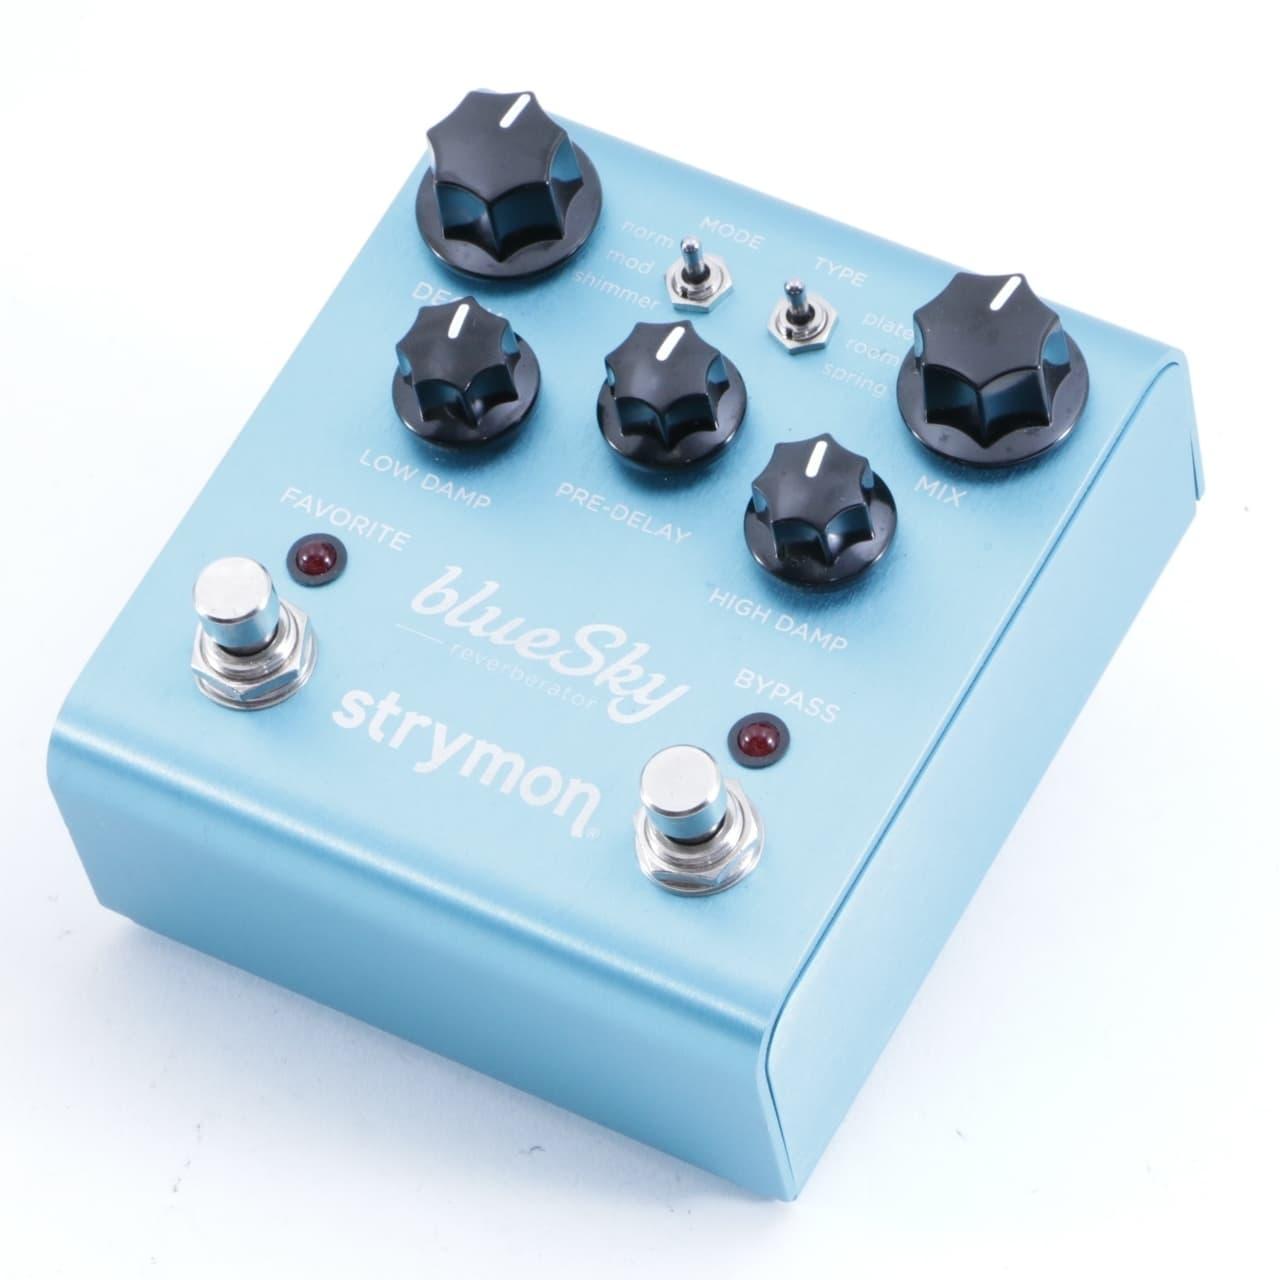 strymon blue sky reverb guitar effects pedal p 05067 reverb. Black Bedroom Furniture Sets. Home Design Ideas